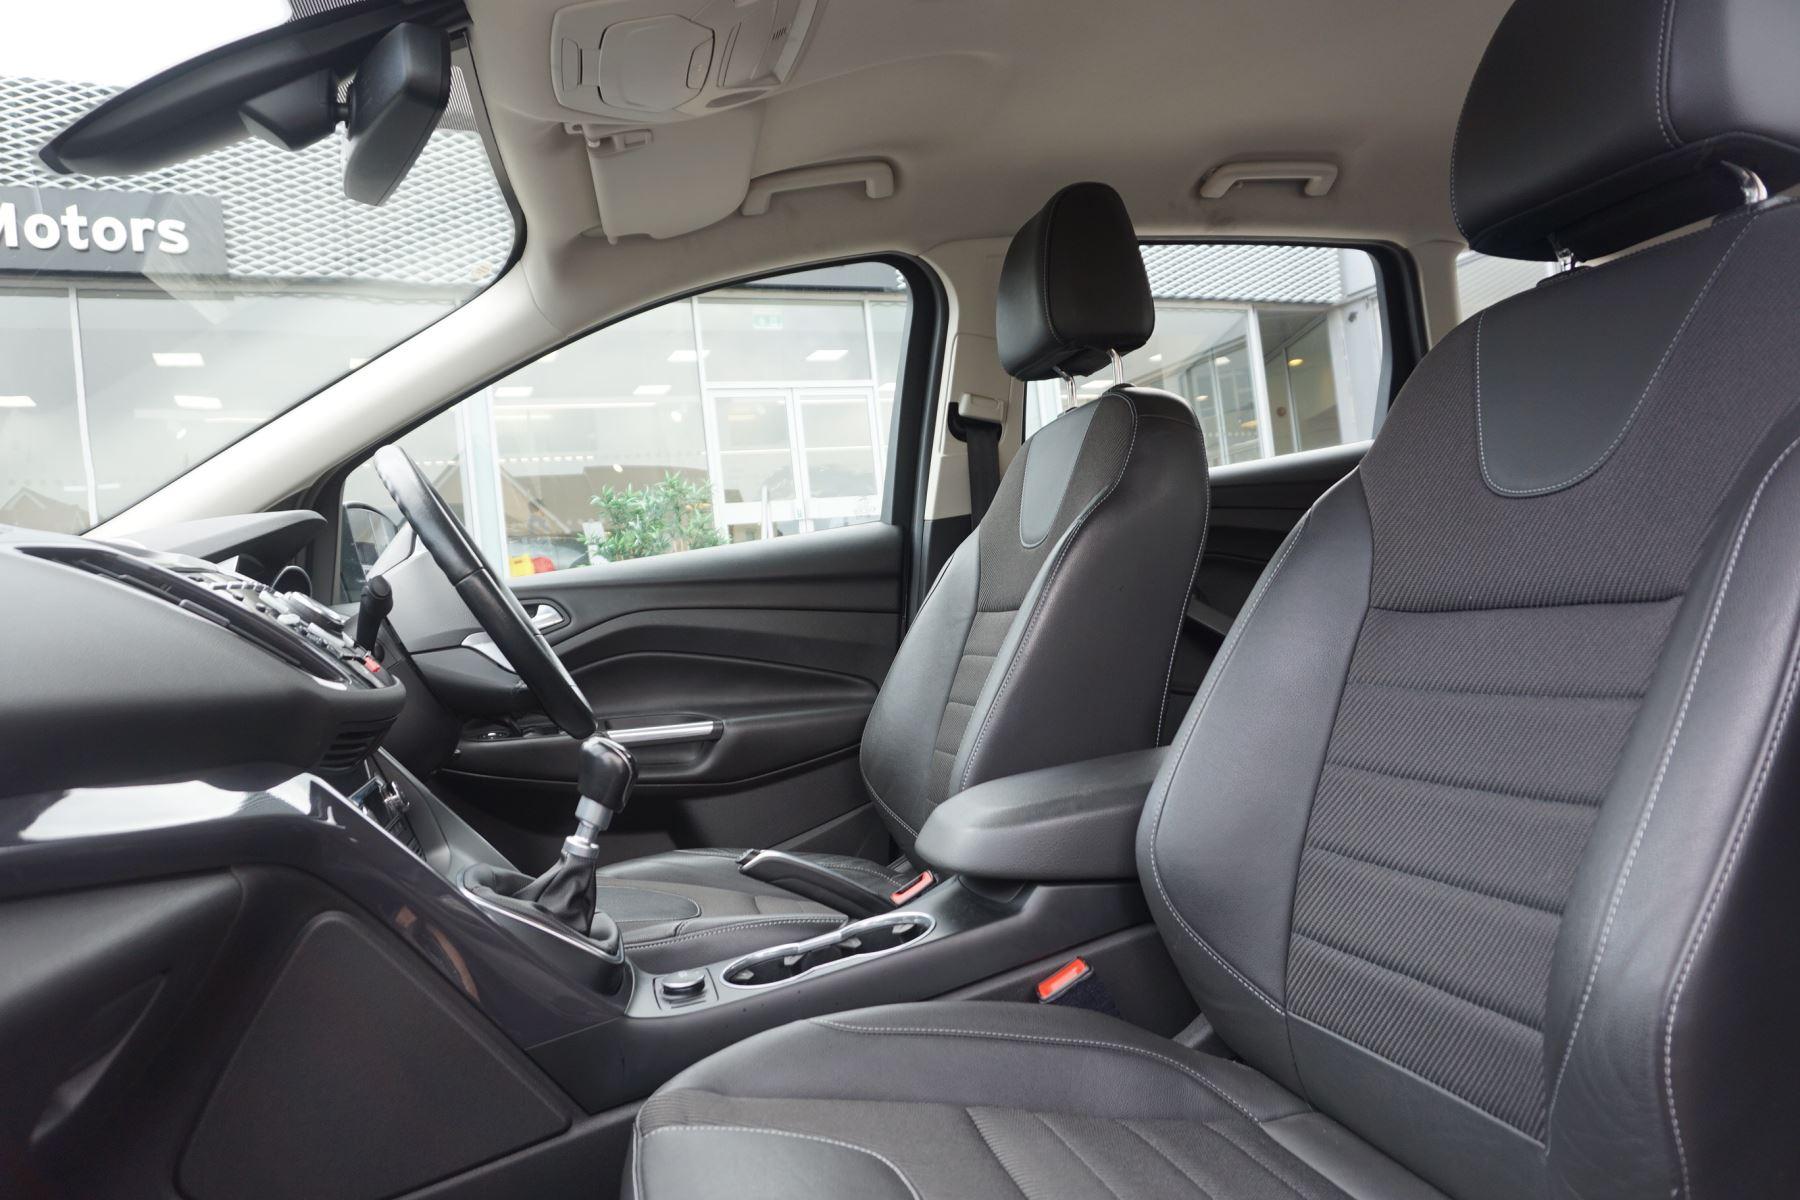 Ford Kuga 2.0 TDCi Titanium 2WD image 8